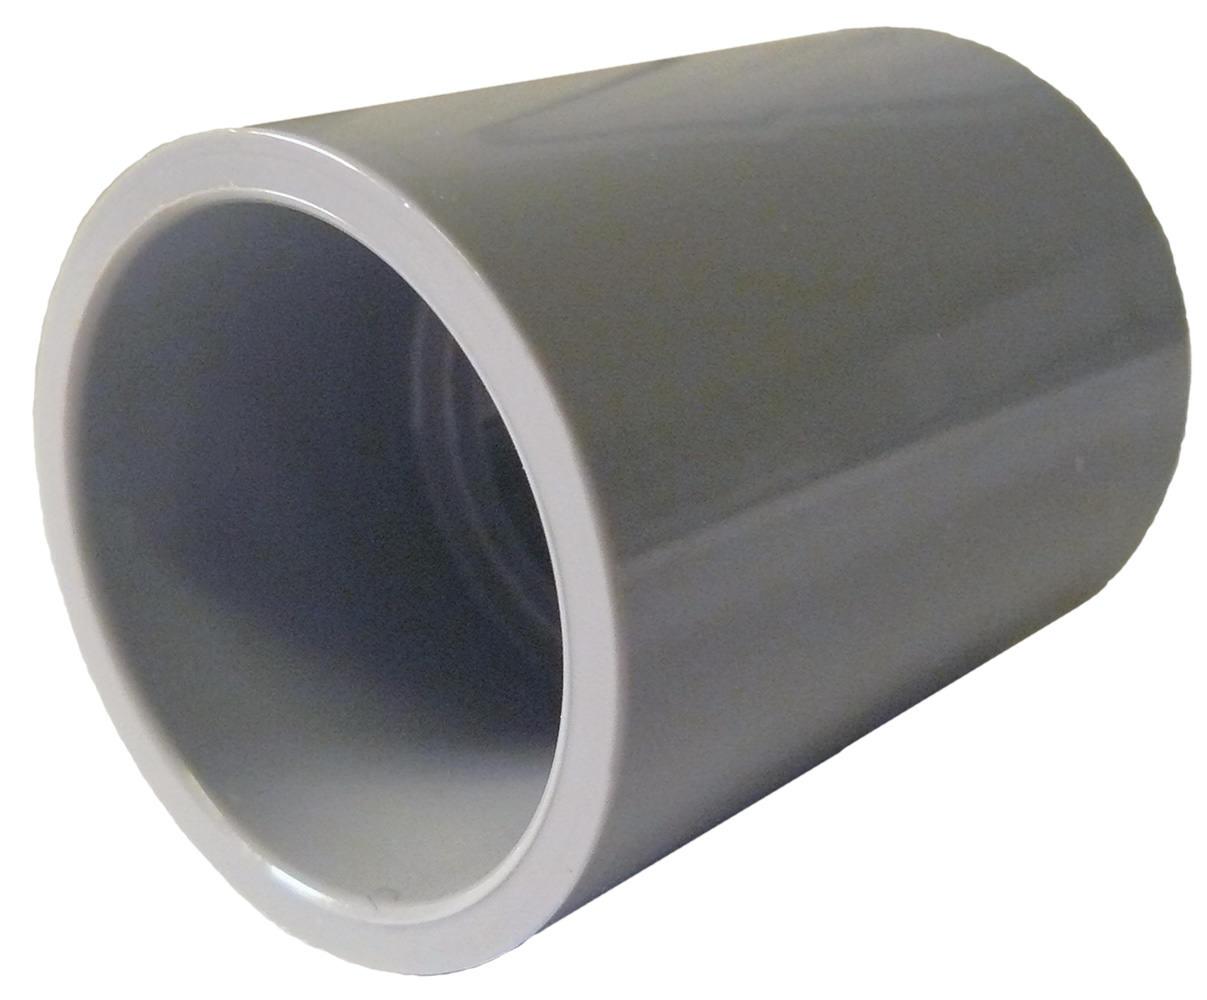 Cantex 6141634 Inc Coupling PVC Conduit 6in